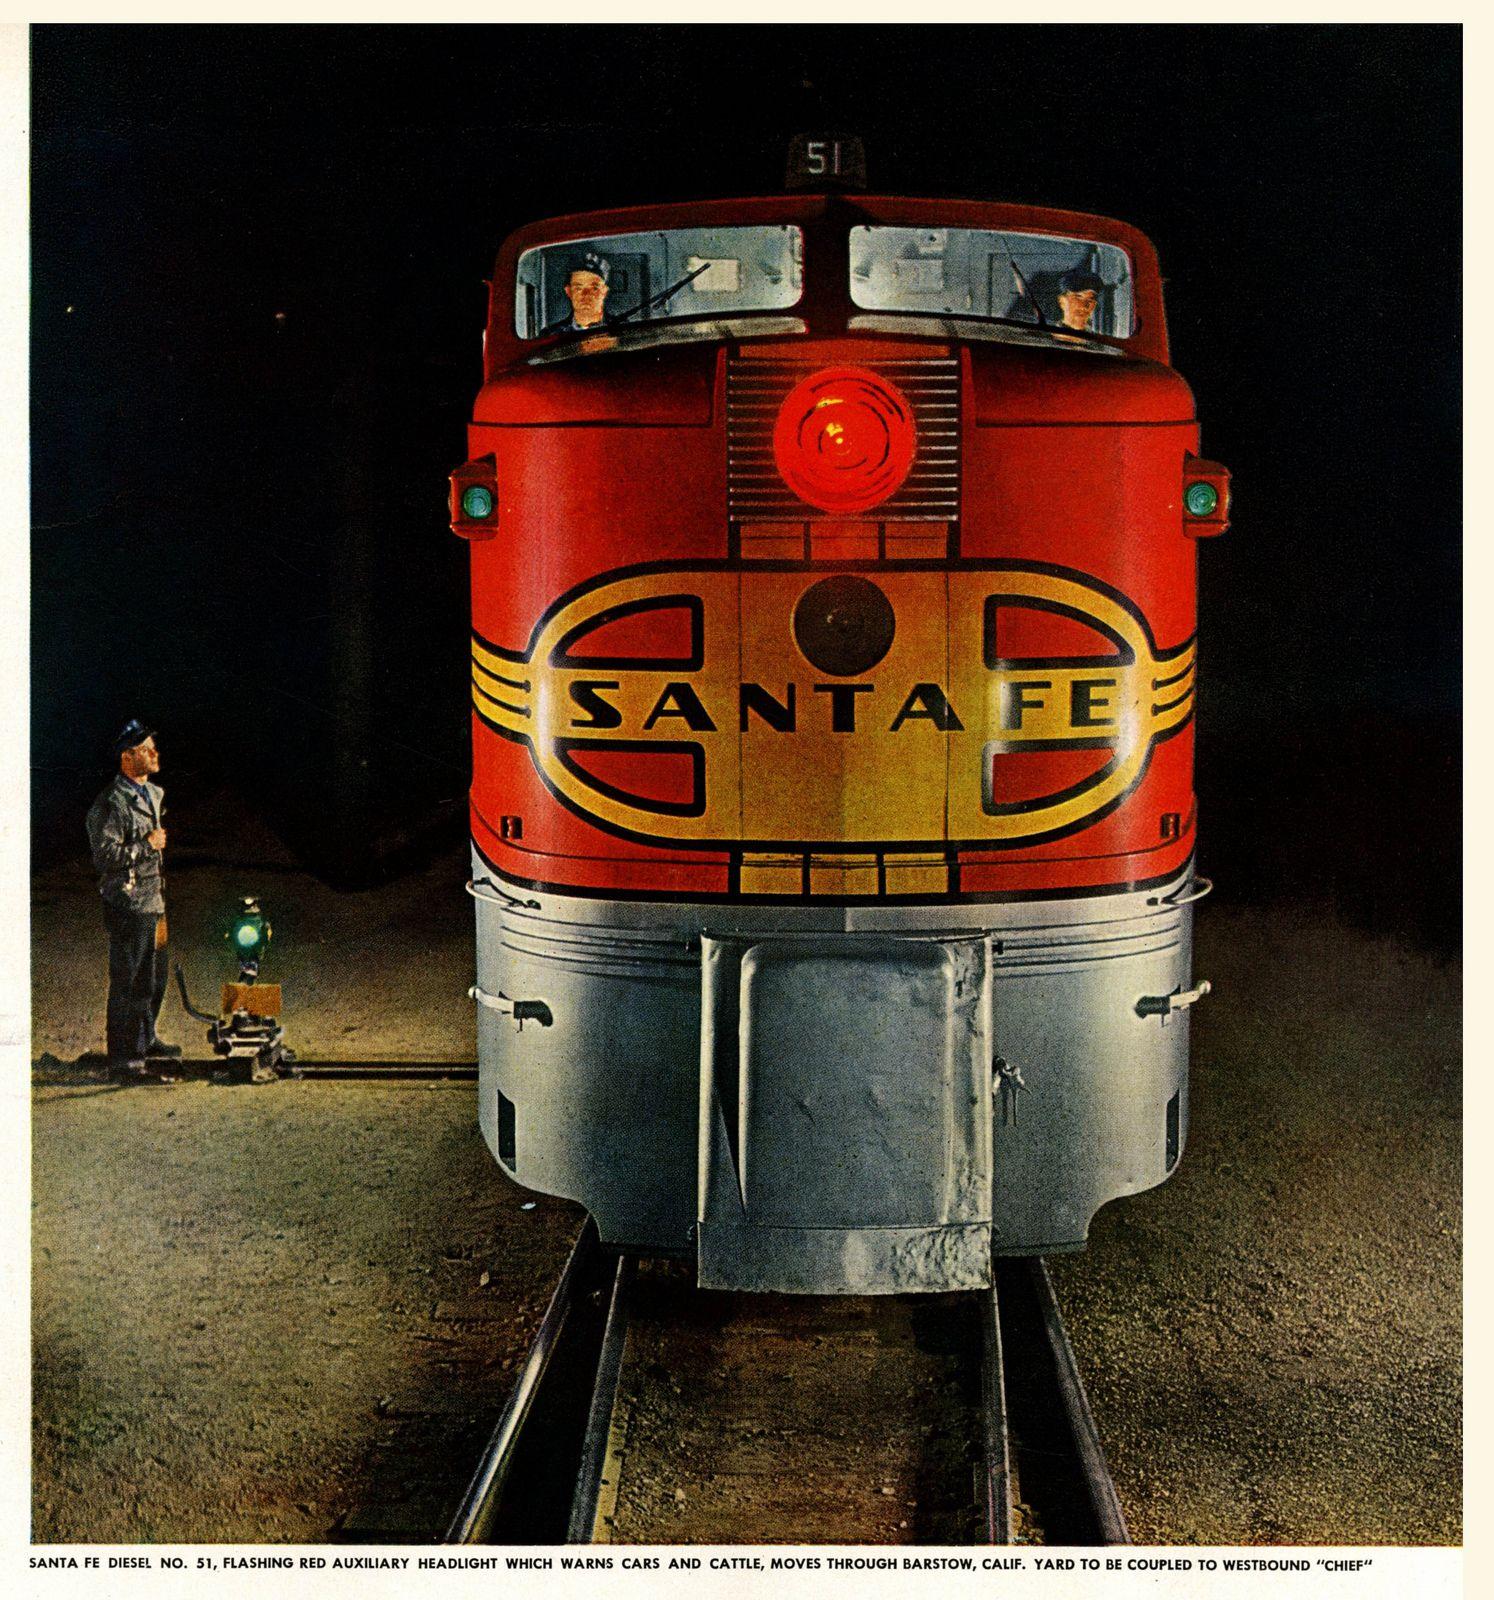 Santa Fe Number 51 Model Trains Santa Fe Vintage Train